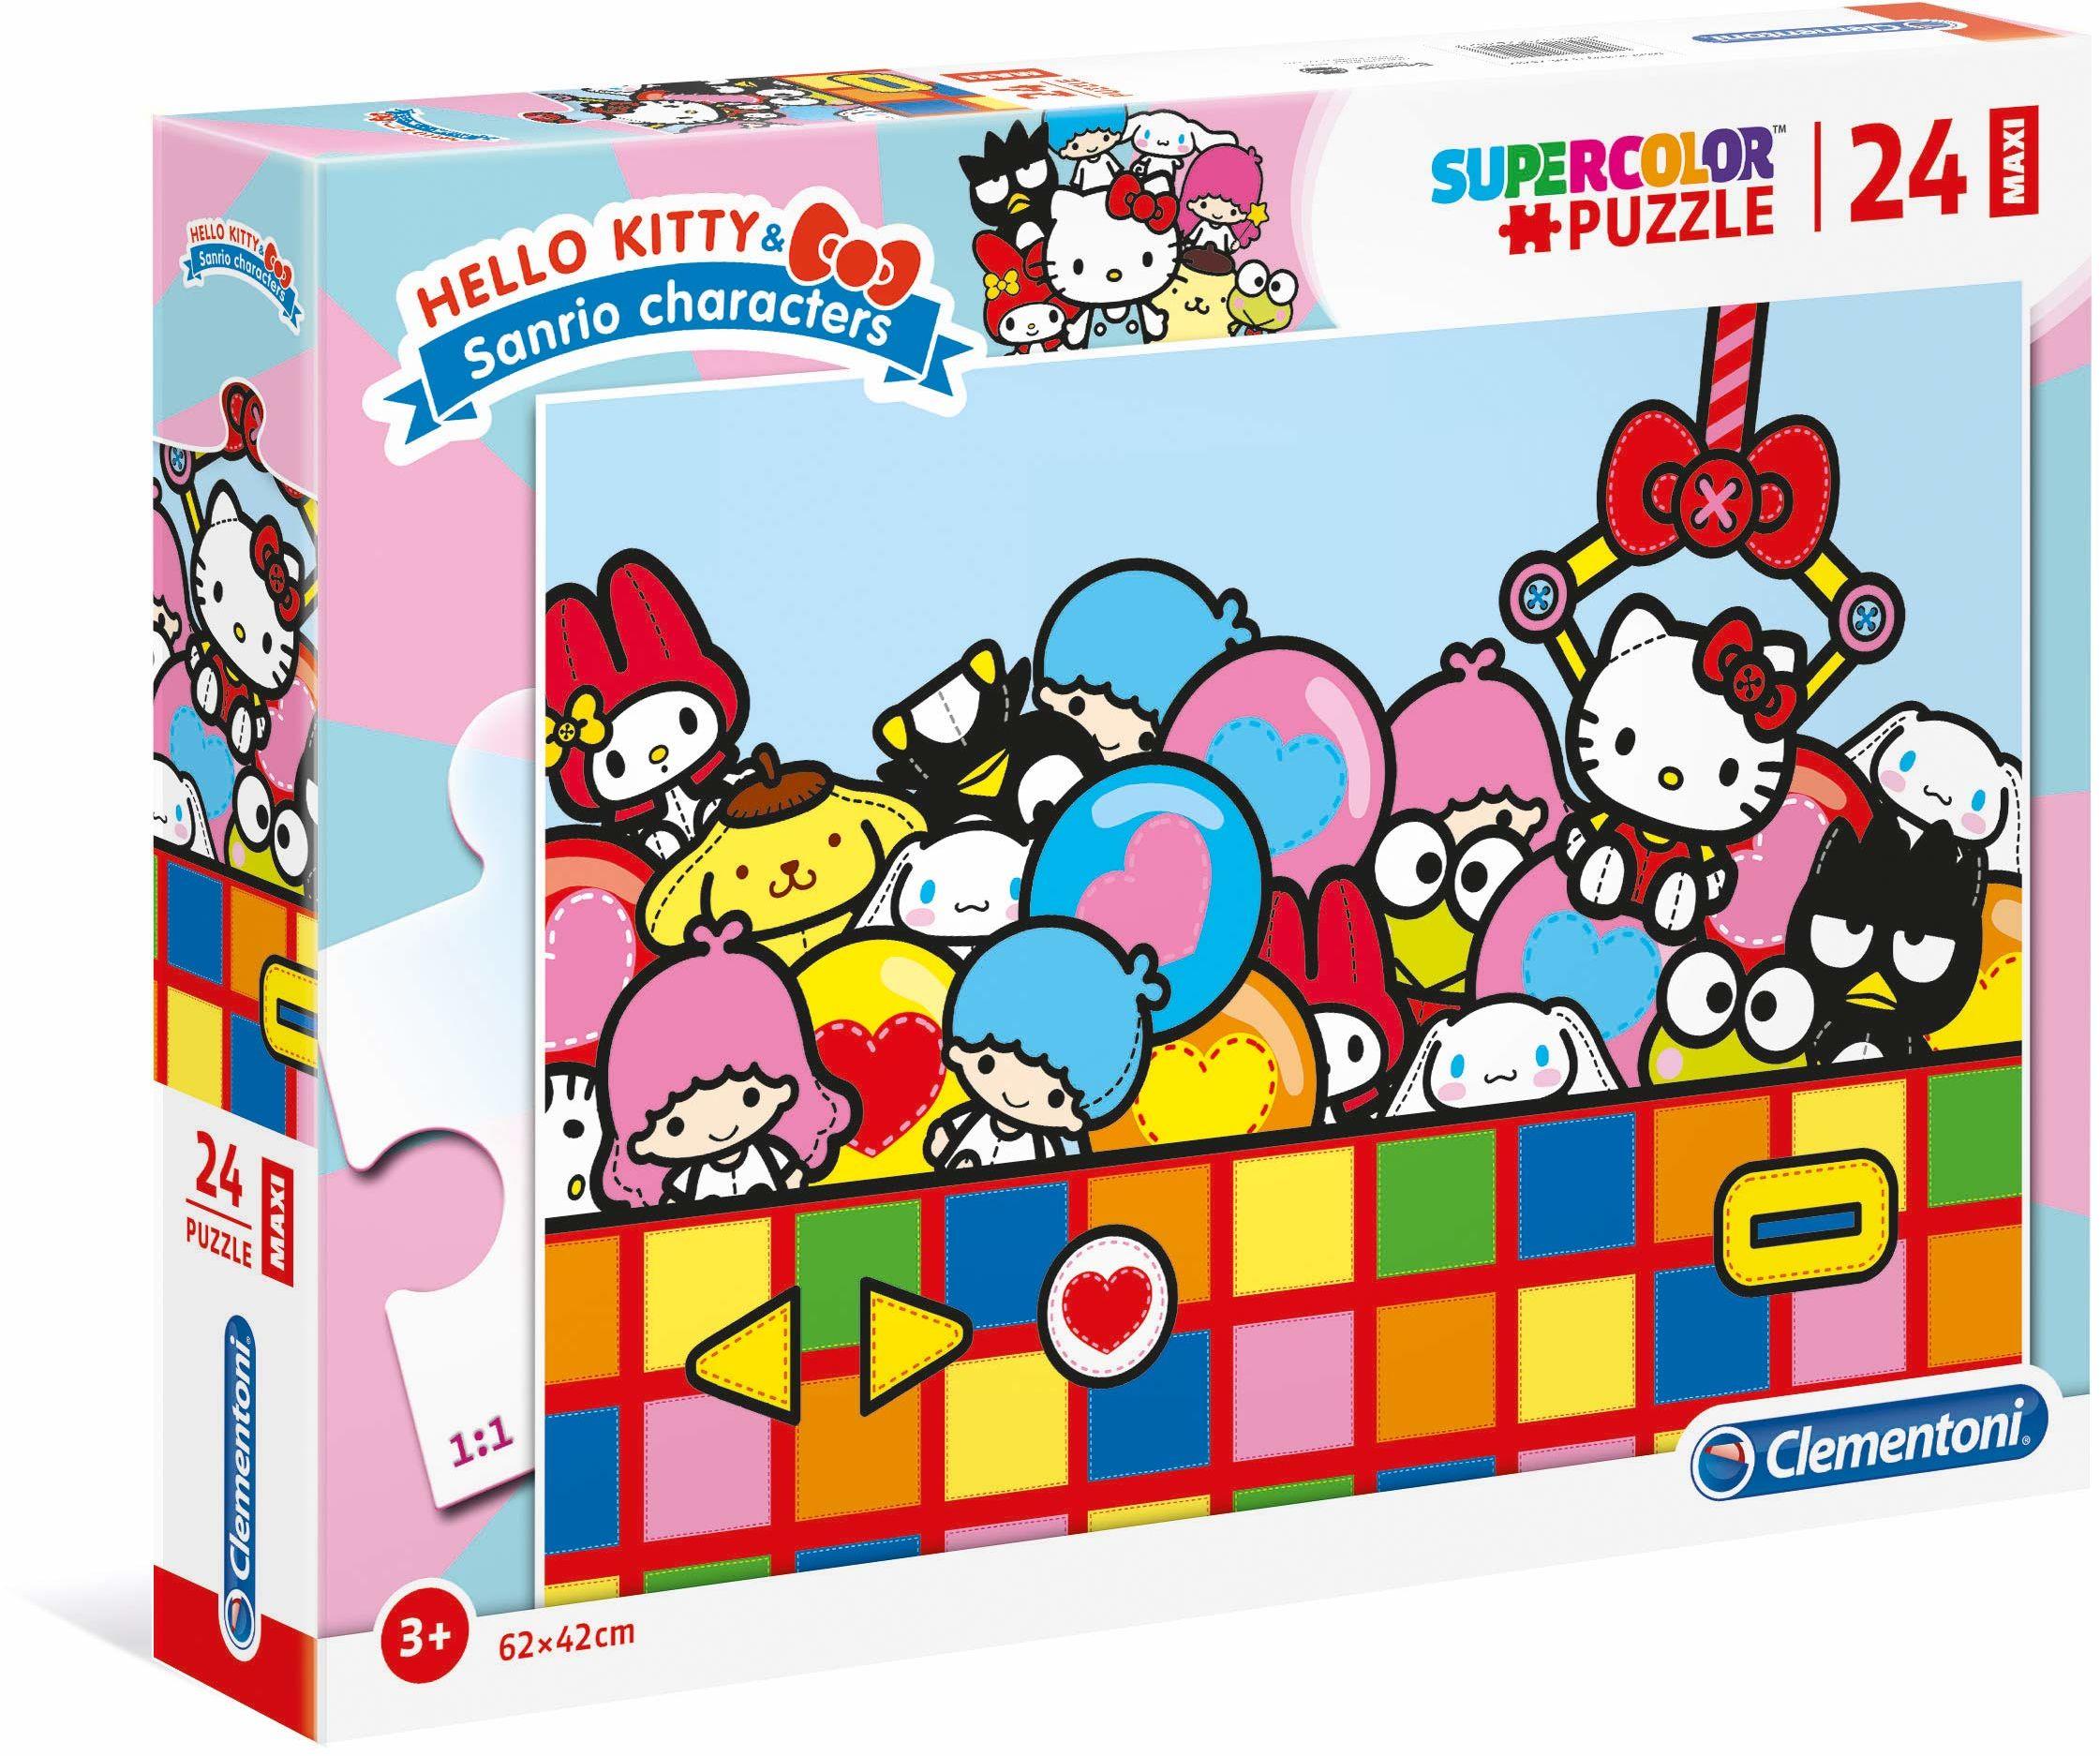 Clementoni 24202 24 szt. Puzzle Maxi - Hello Kitty